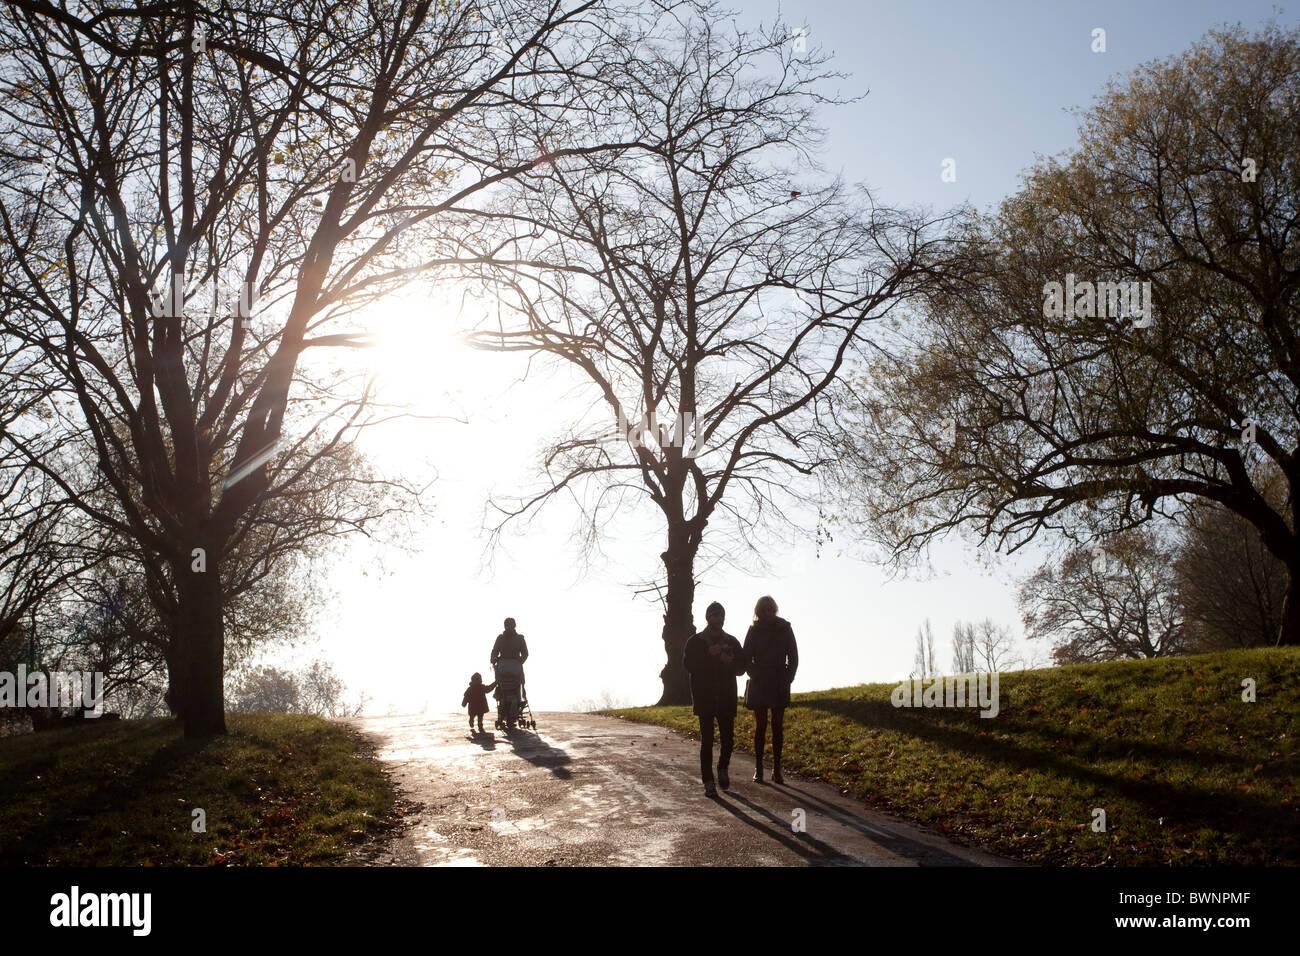 Hampstead Heath. People walking amongst autumn trees. London, England, UK - Stock Image